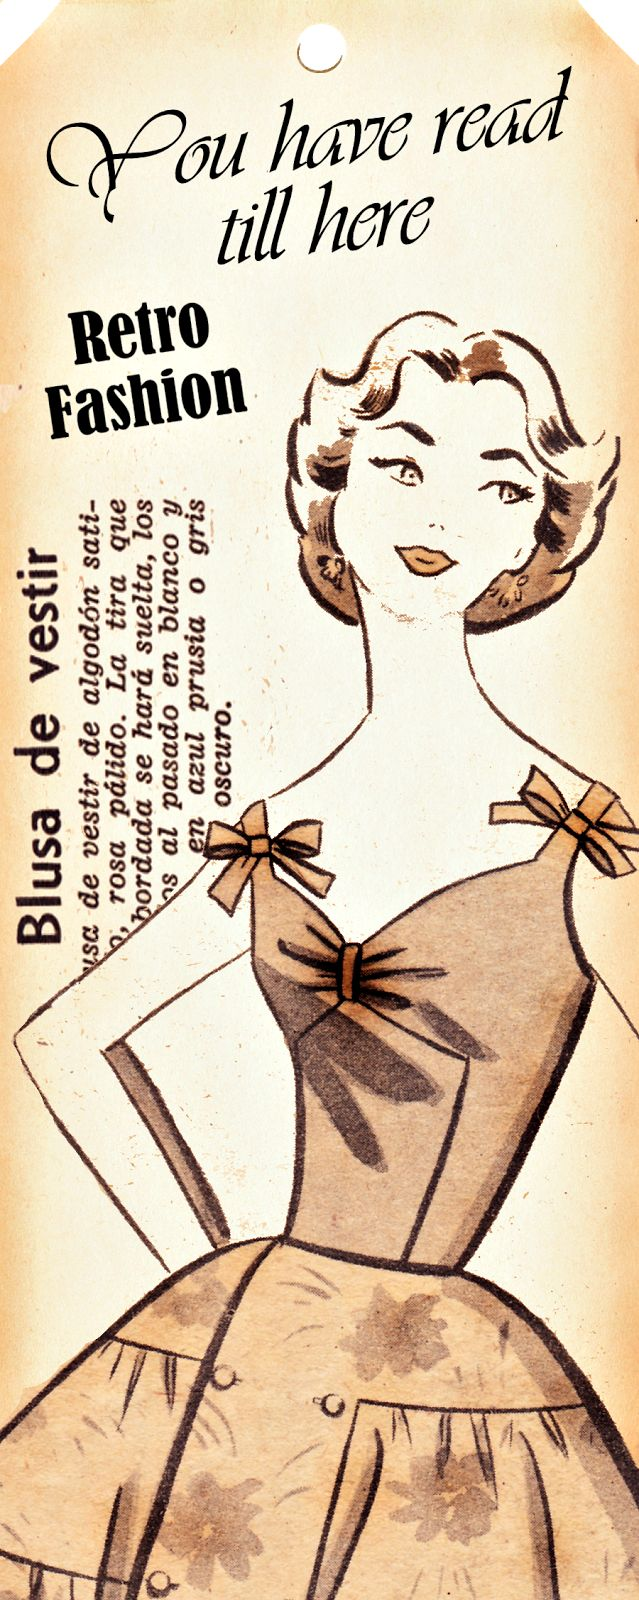 Boulevard de L'antique - Retro Scraps: Free Printable Retro Fashion Bookmarks/Tags